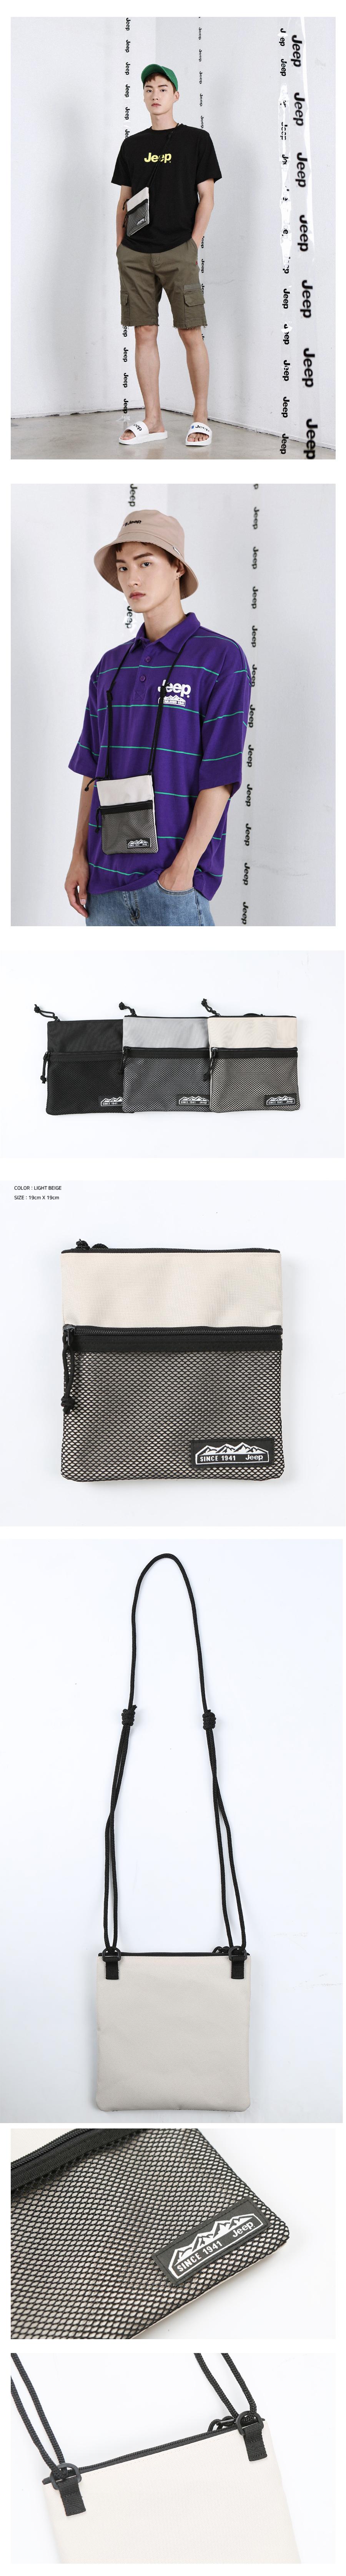 Mesh Mini Bag (GK5GAU521LE)